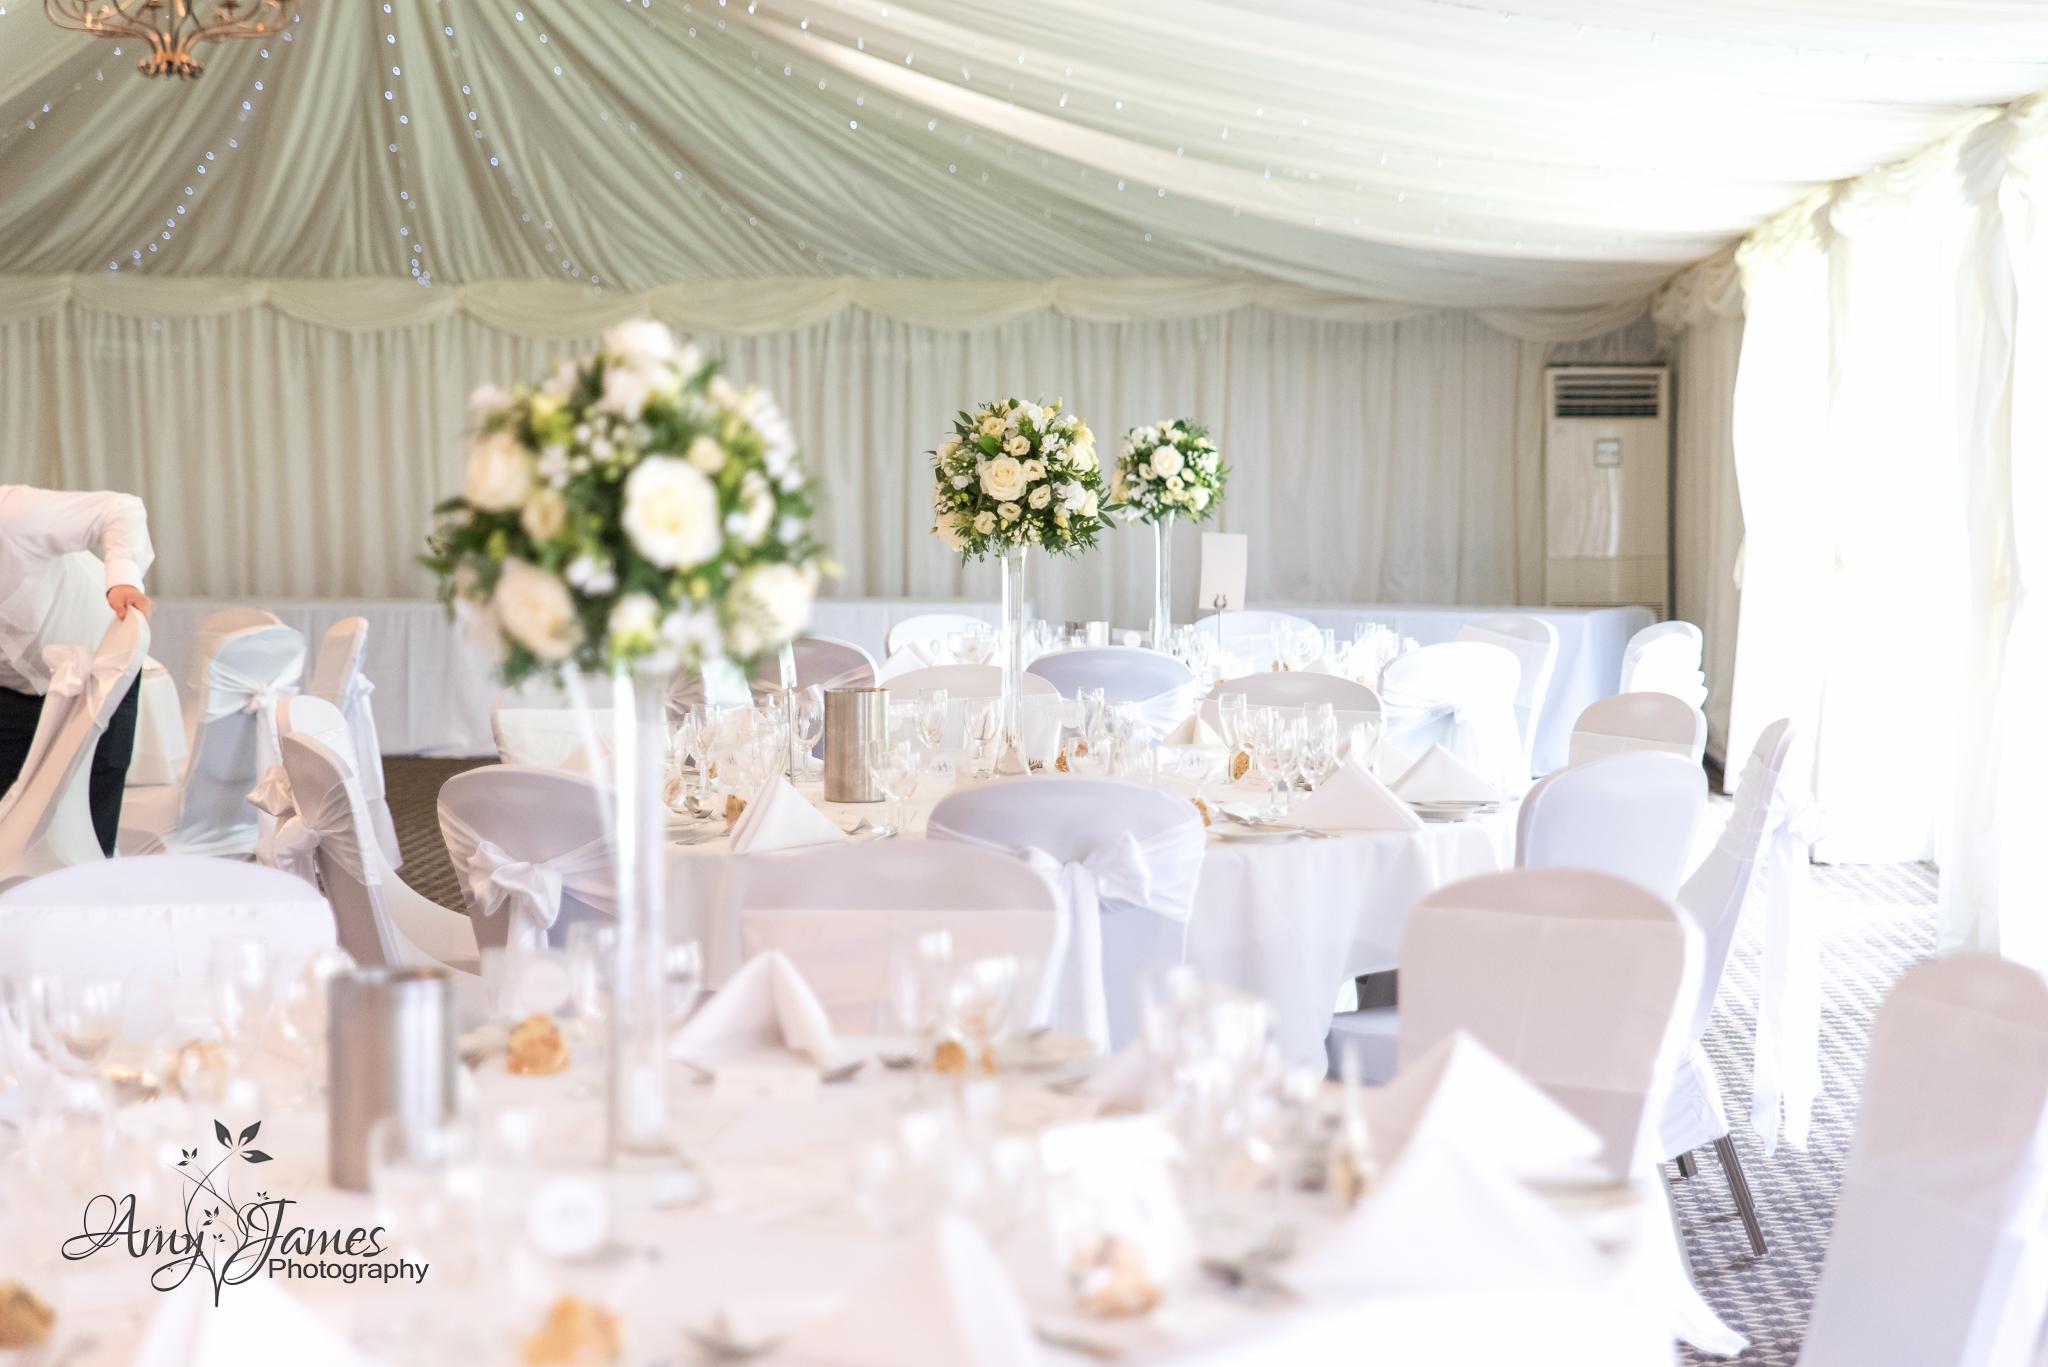 Amy James Photography // Hampshire Wedding Photographer // Hamoshire wedding venues // Surrey Wedding Venues // Audley Wood Hotel Wedding // Marquee wedding